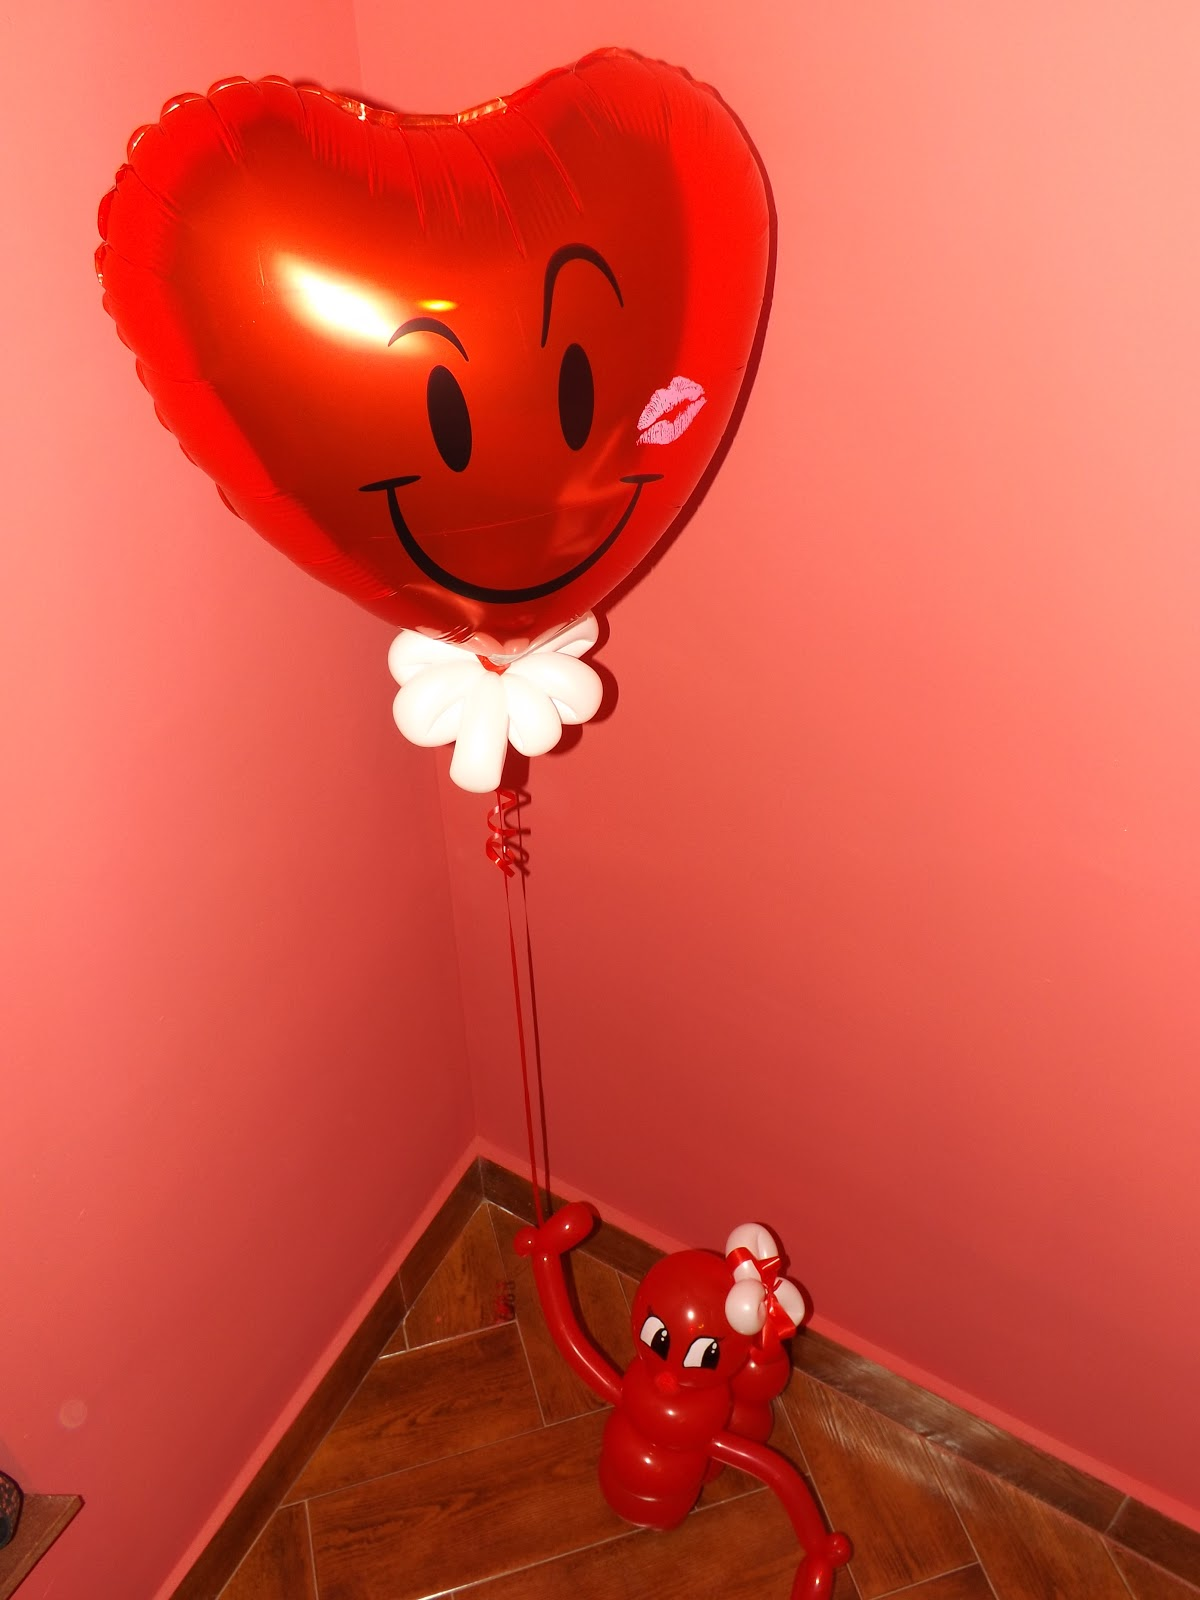 Decoraciones d 39 globos san valentin d 39 globos - Decorar para san valentin ...